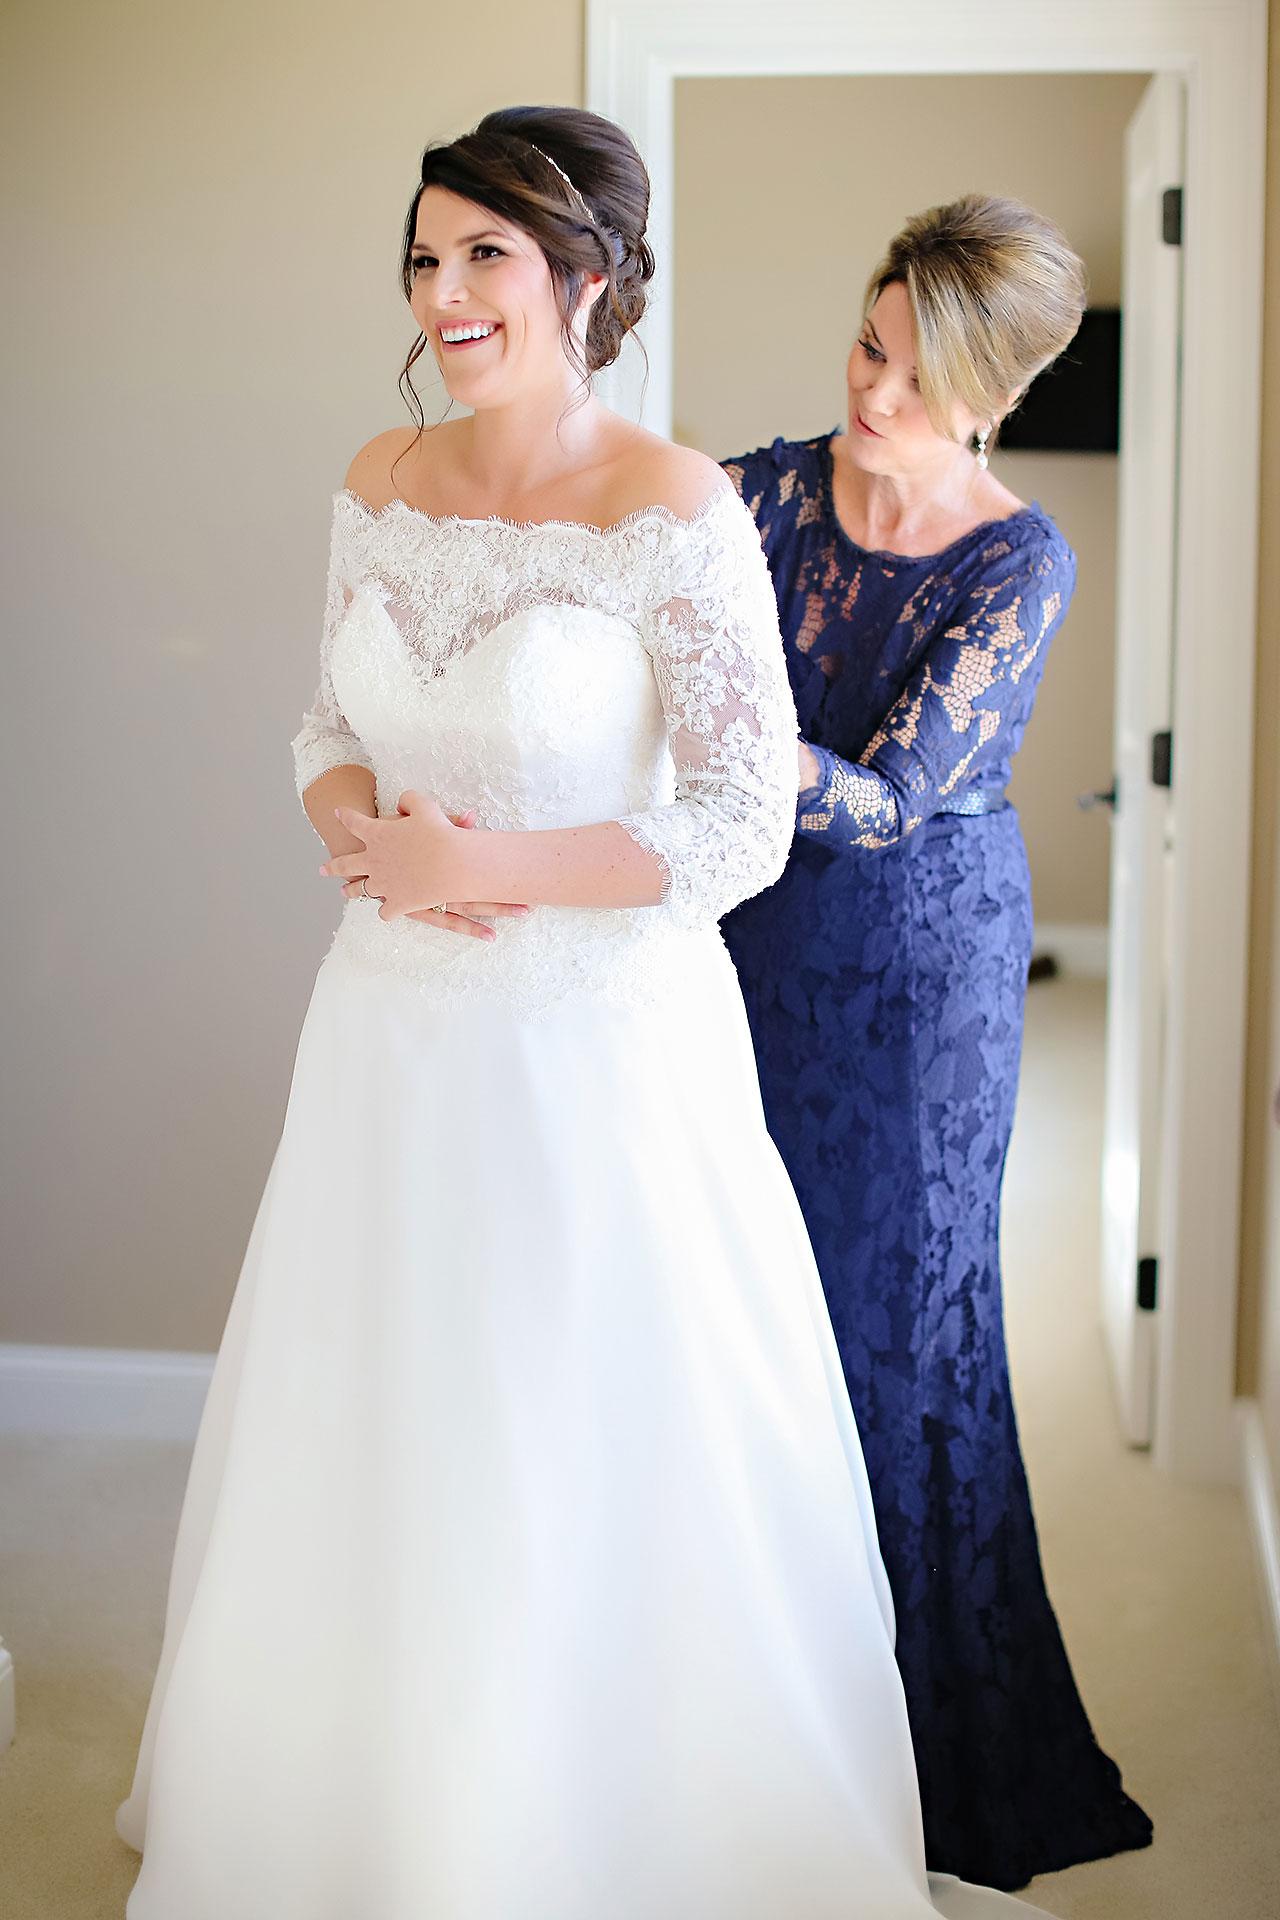 Emily JD Carmel Indiana Wedding 028